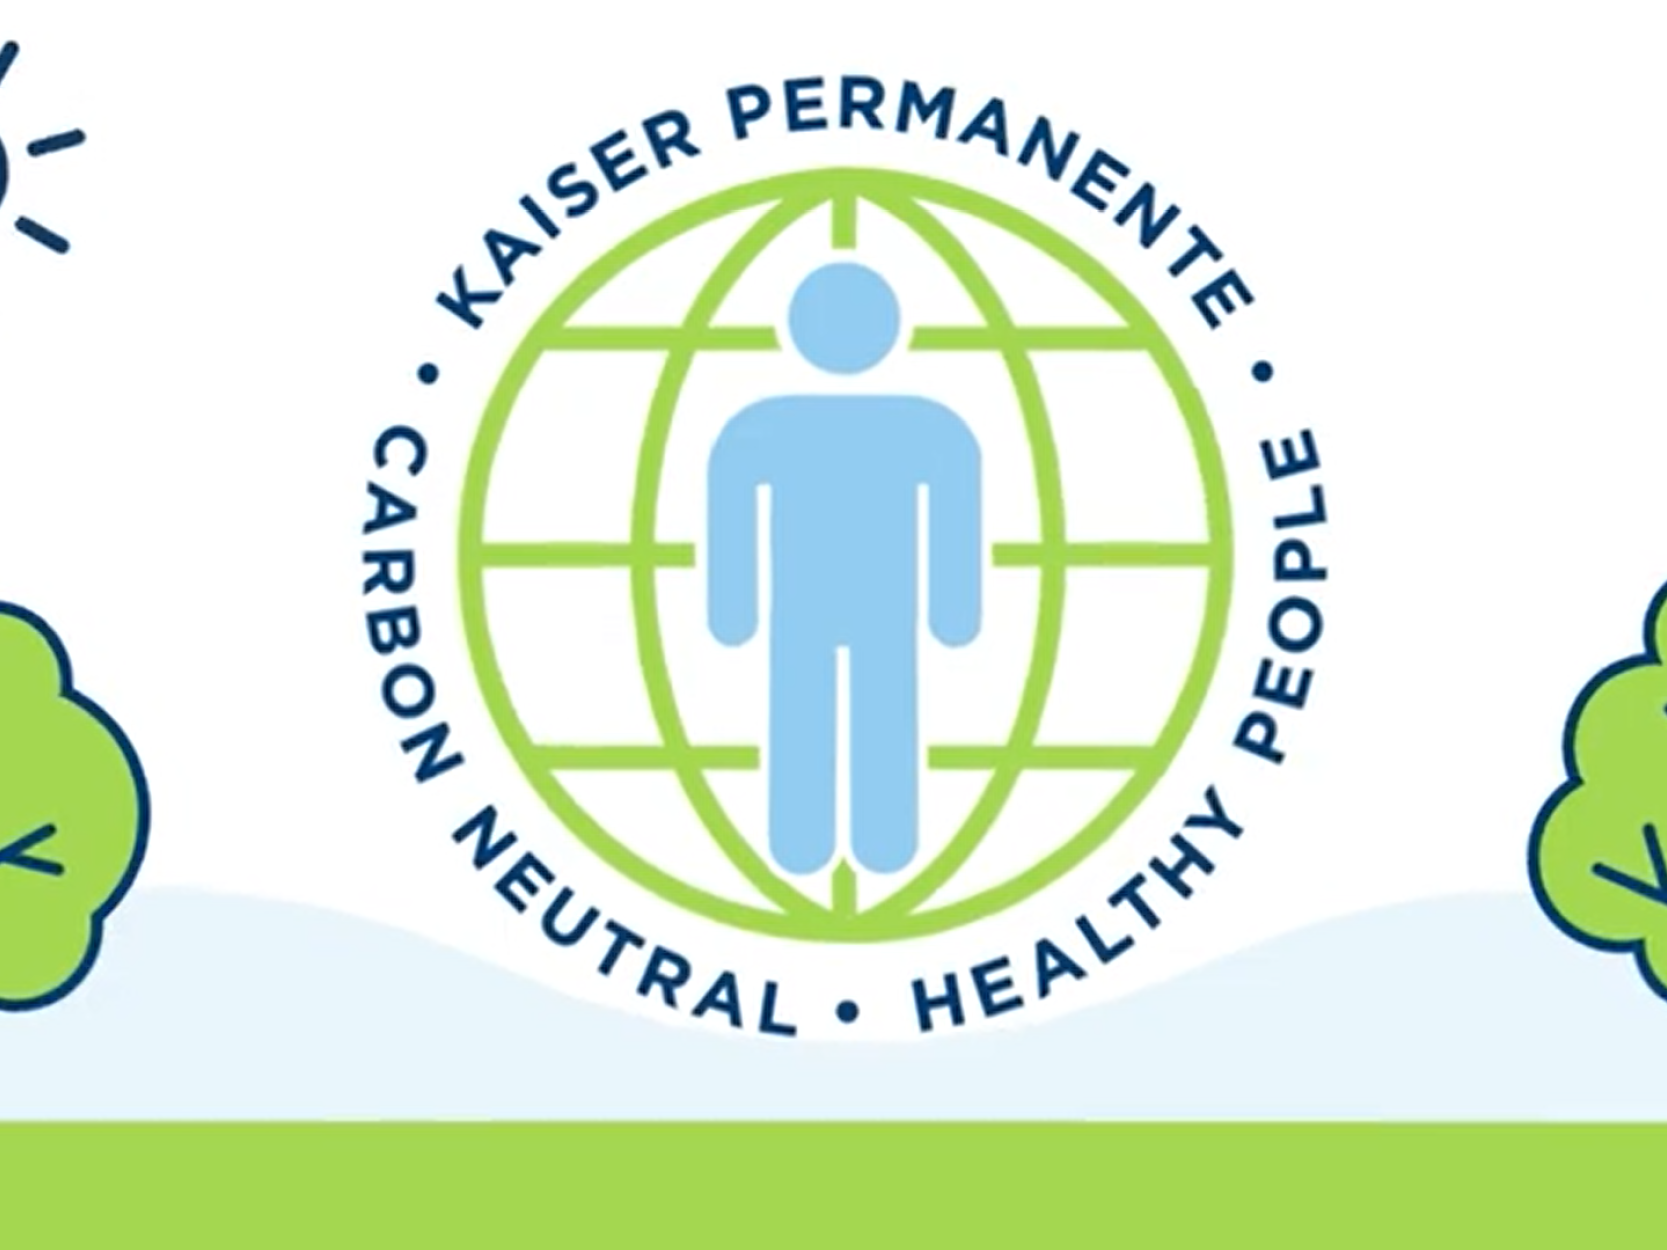 Kaiser Permanente Becomes Carbon Neutral